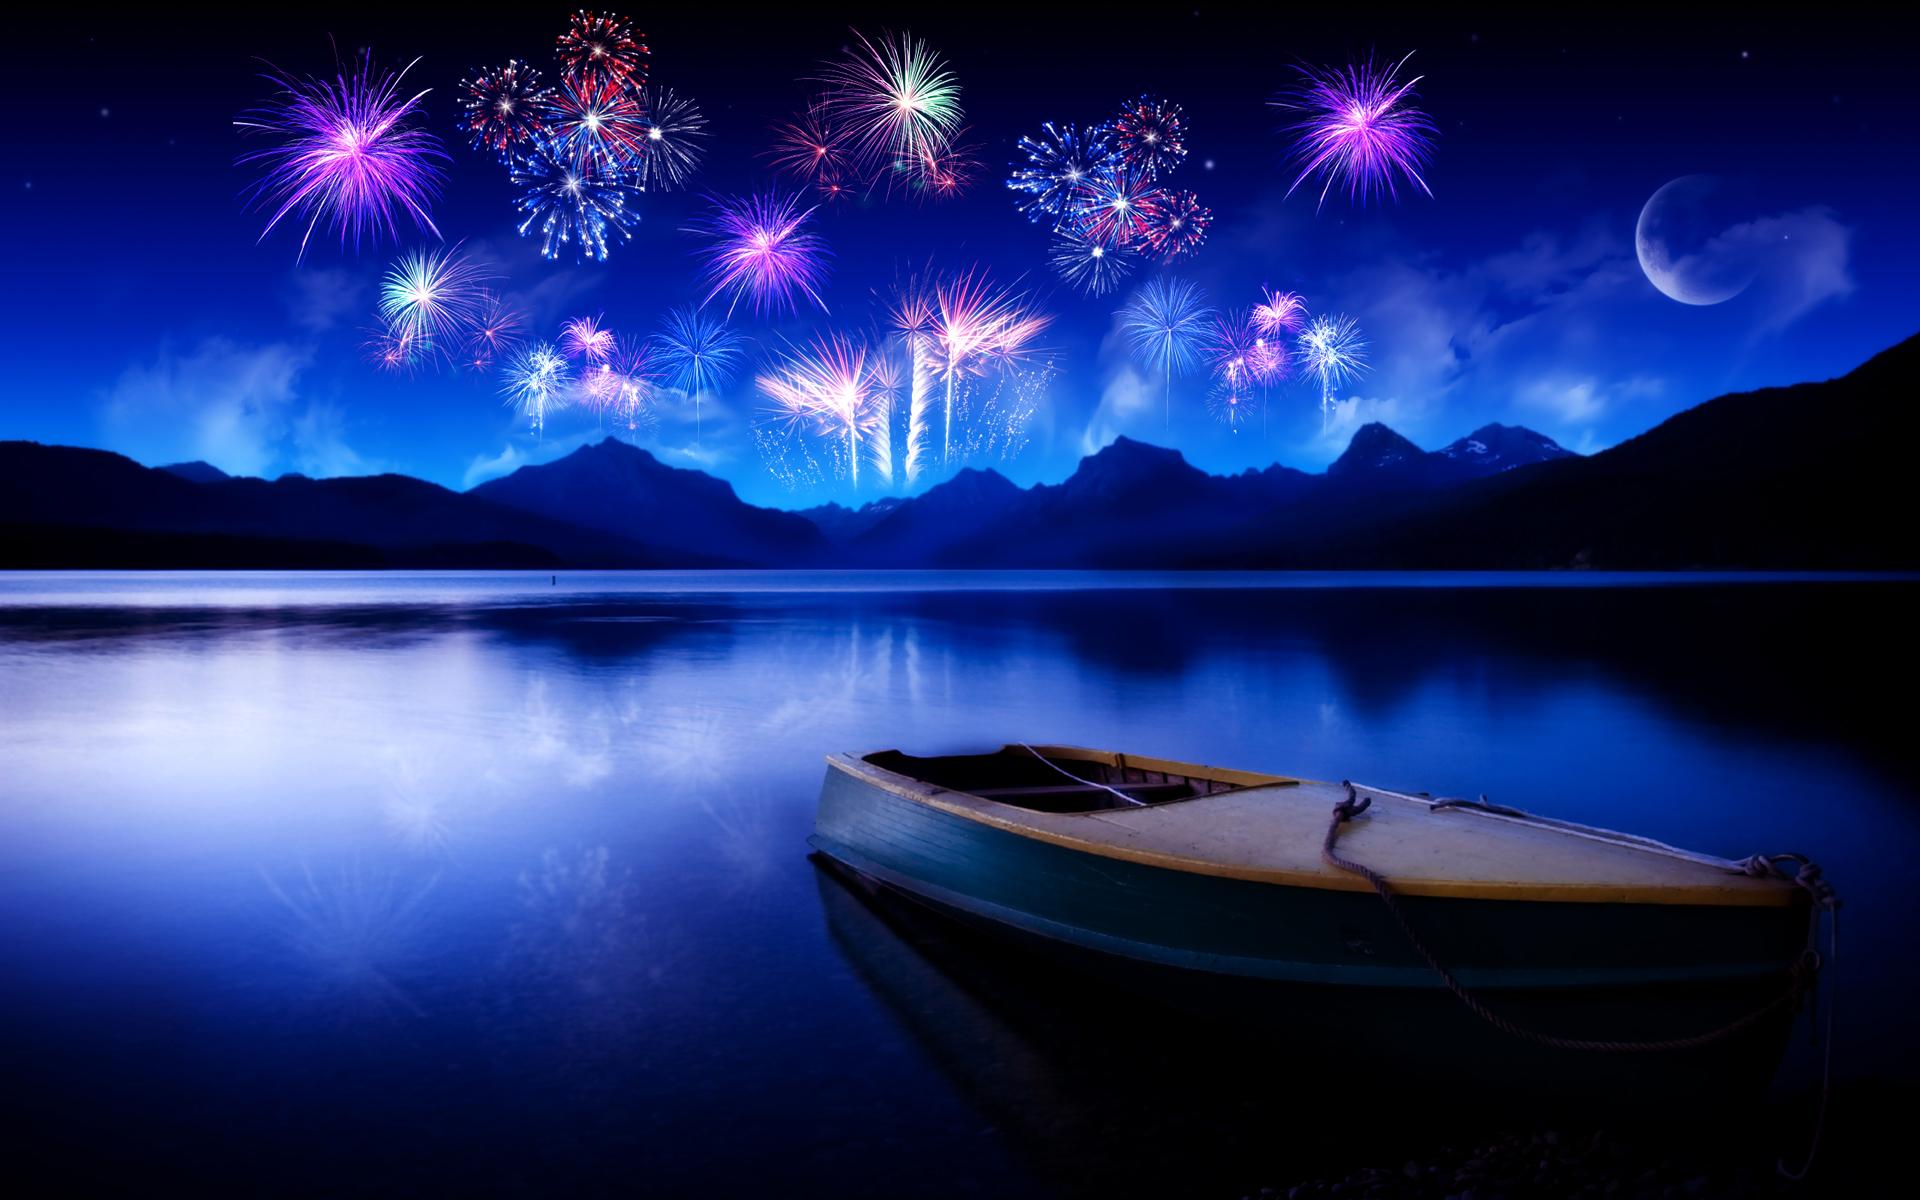 http://memberfiles.freewebs.com/36/84/56238436/photos/New-HD-Wallpaper/154.jpg